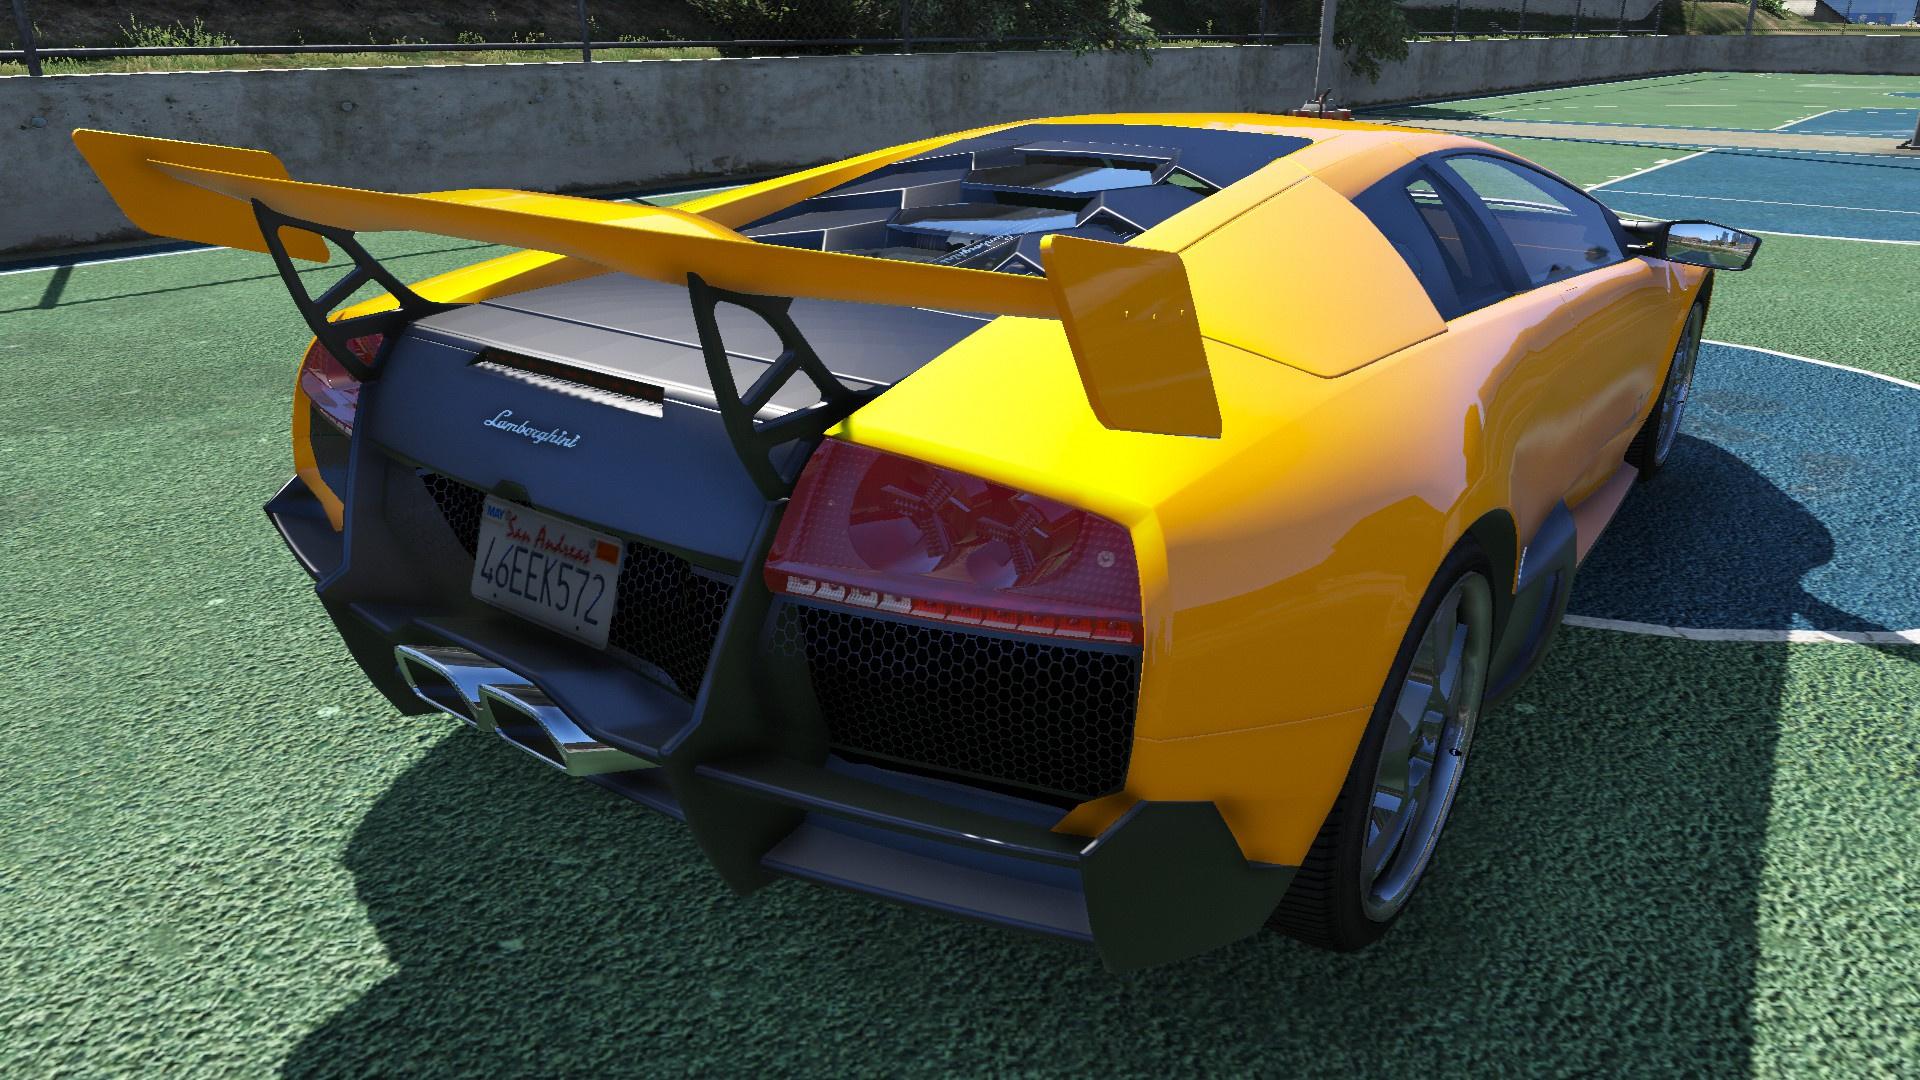 2010 Lamborghini Murcielago Lp 670 4 Sv Gta5 Mods Com